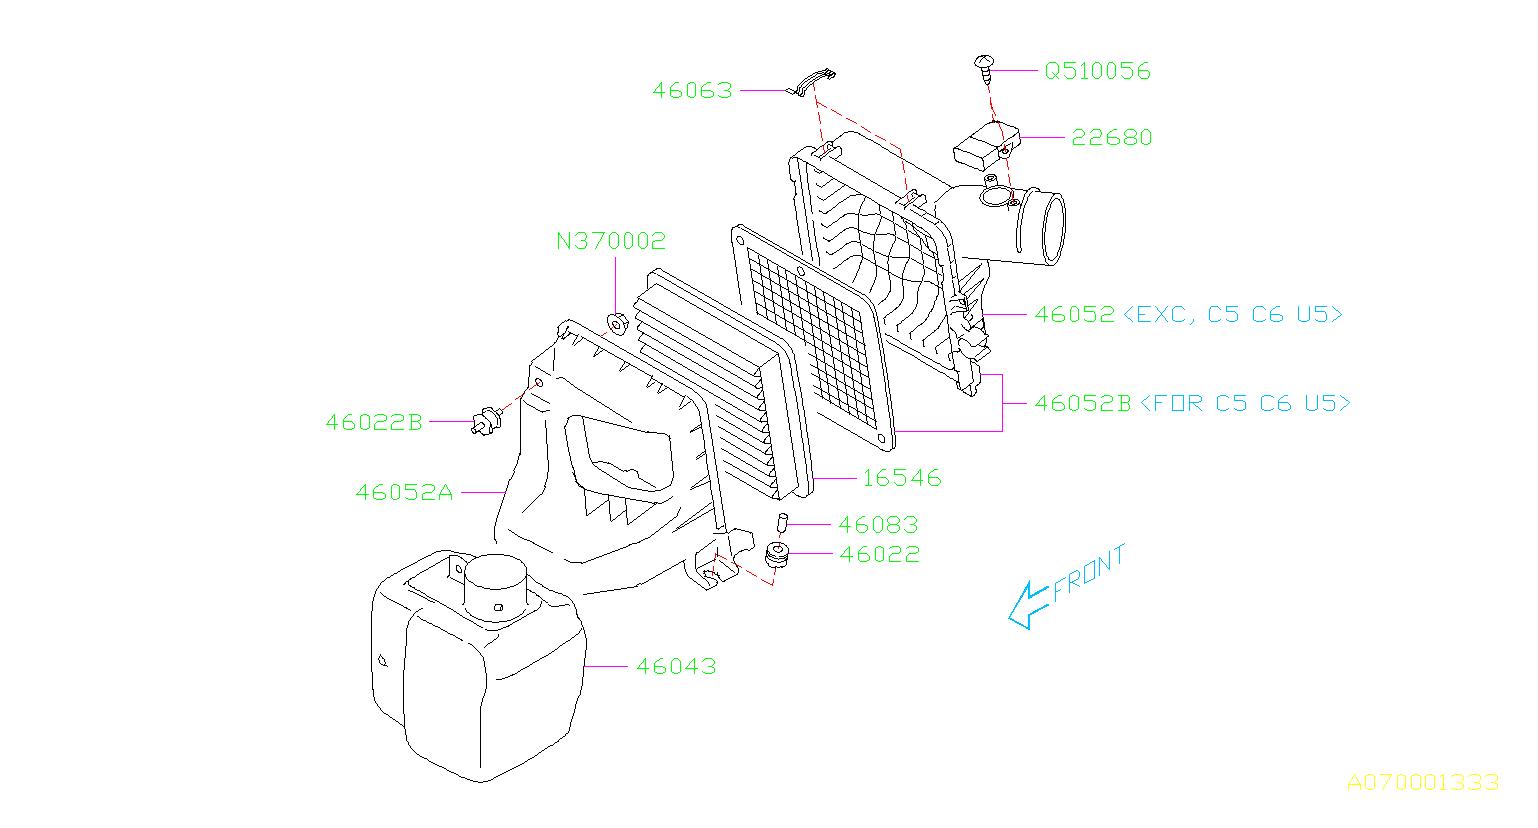 Subaru Forester Engine Air Intake Resonator. Used to